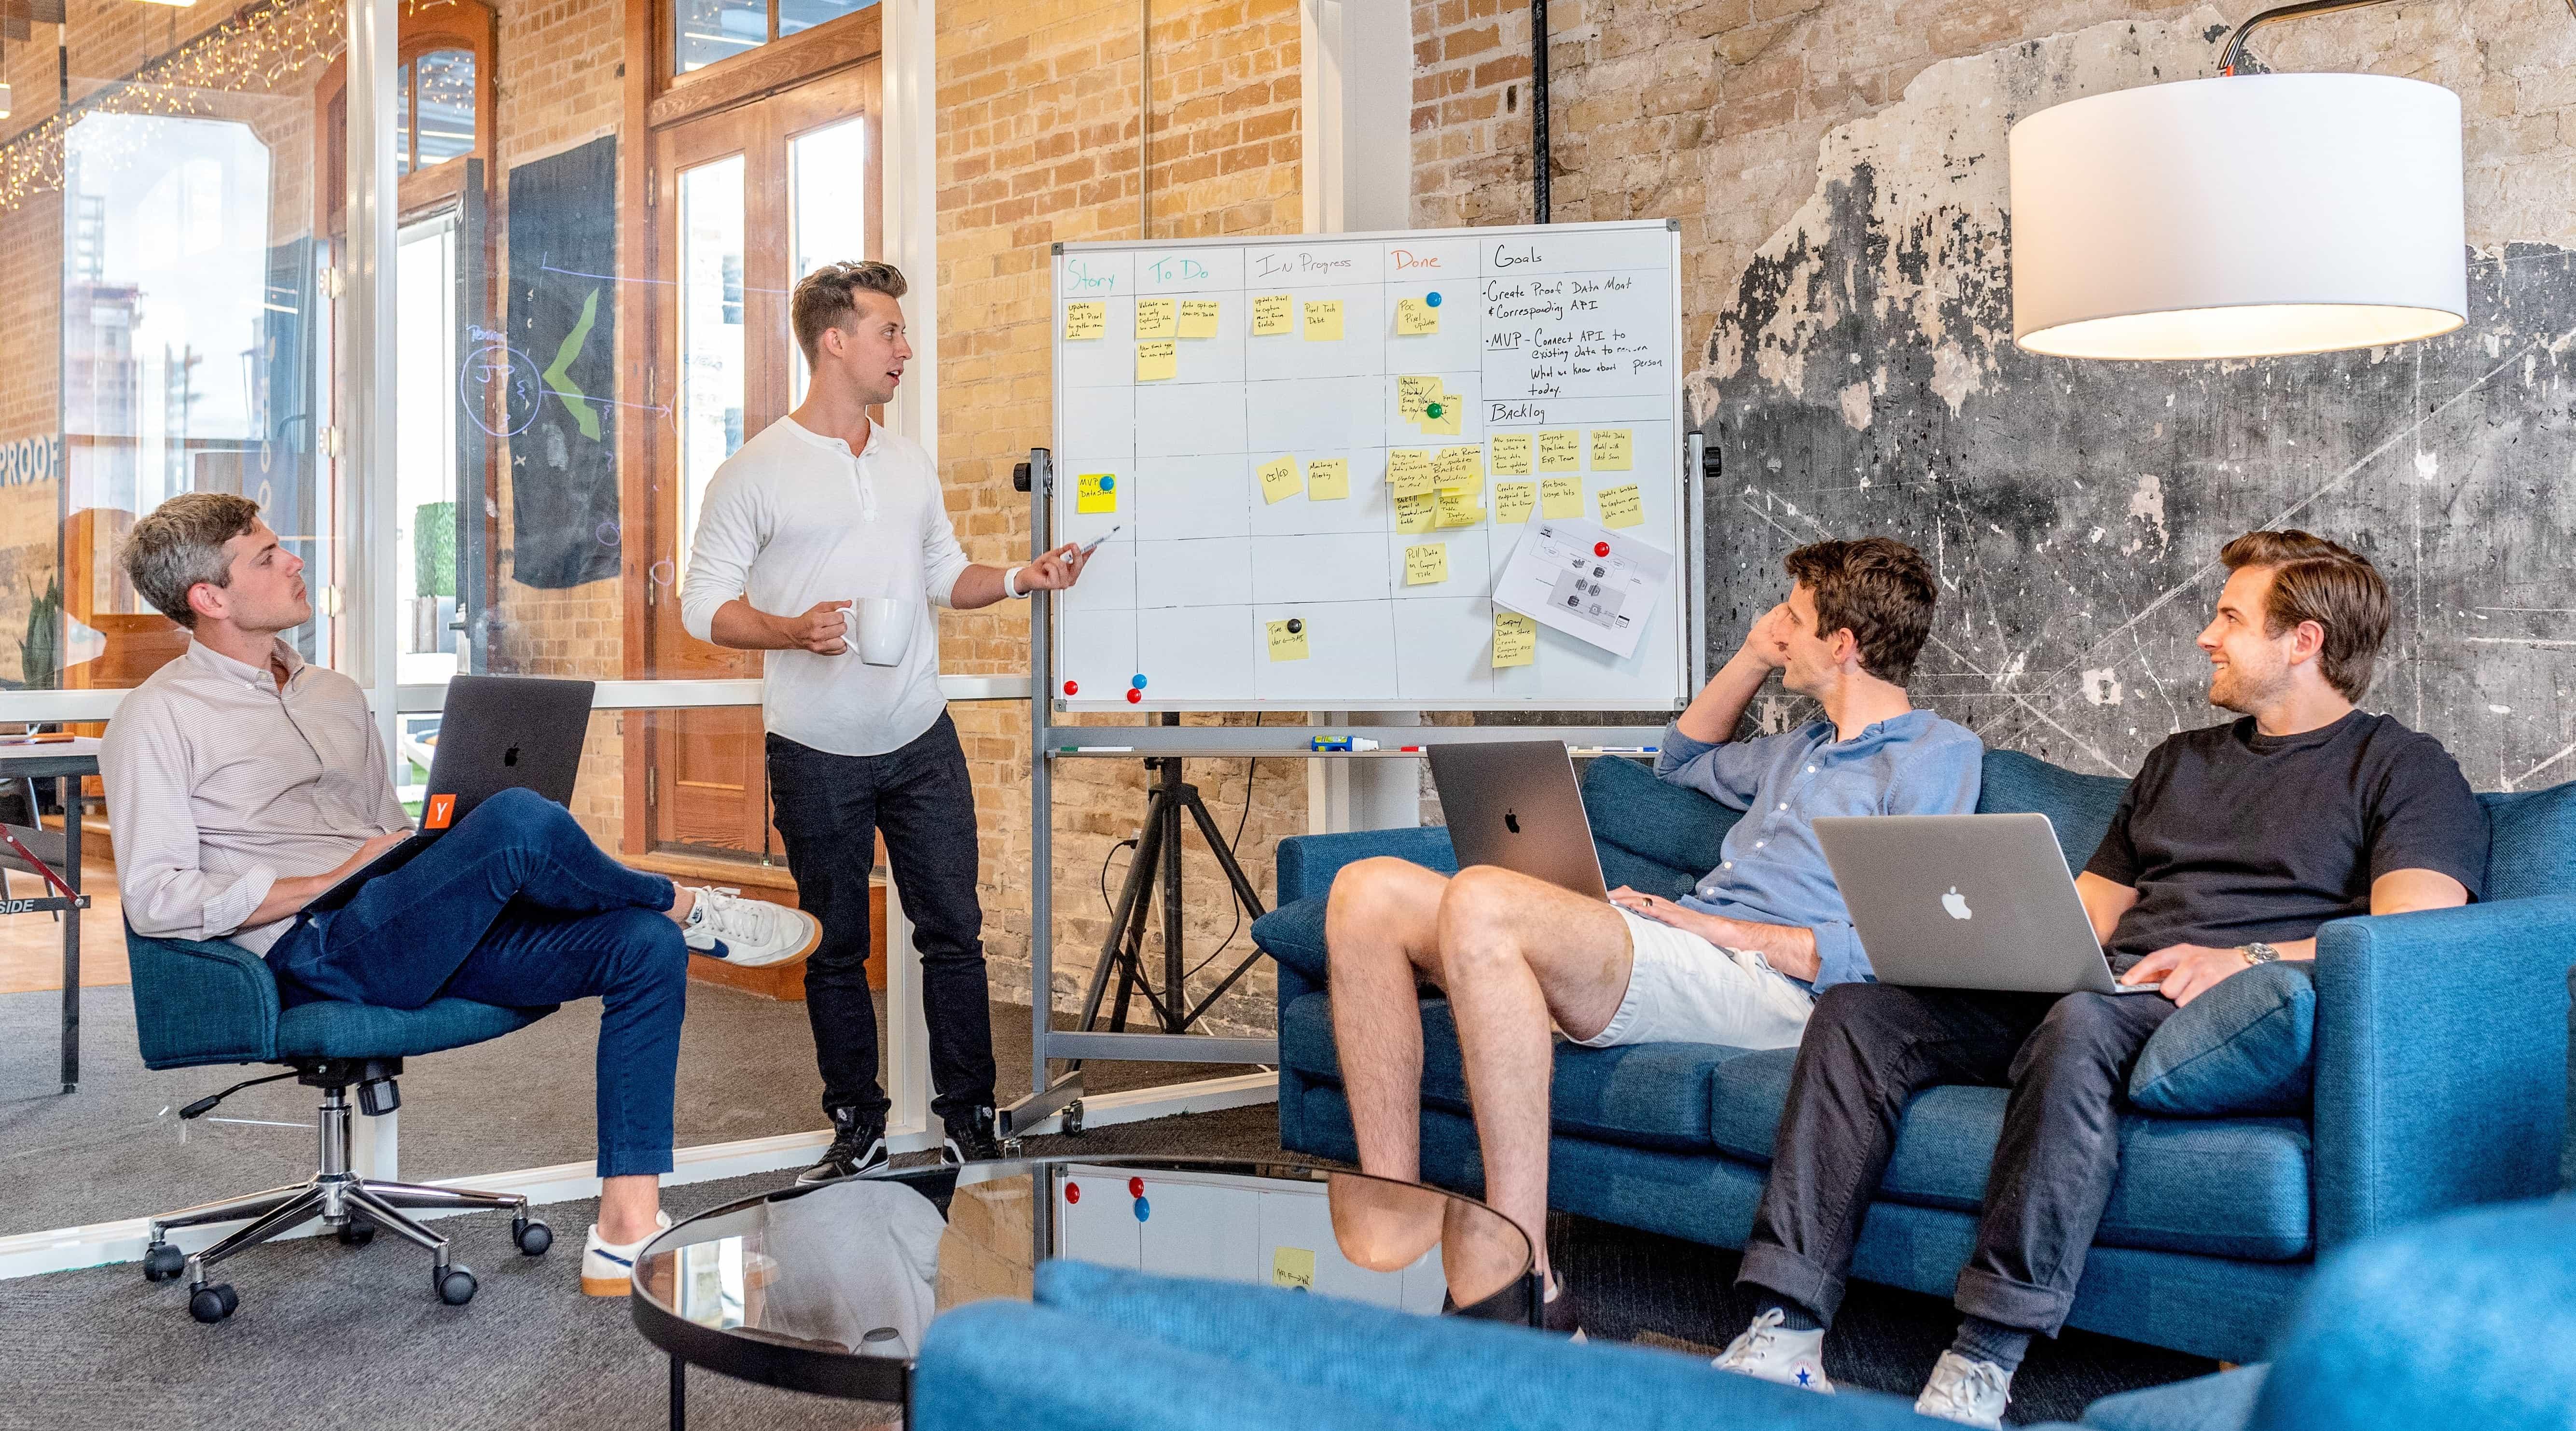 best video marketing tools 2020 - marketing meeting